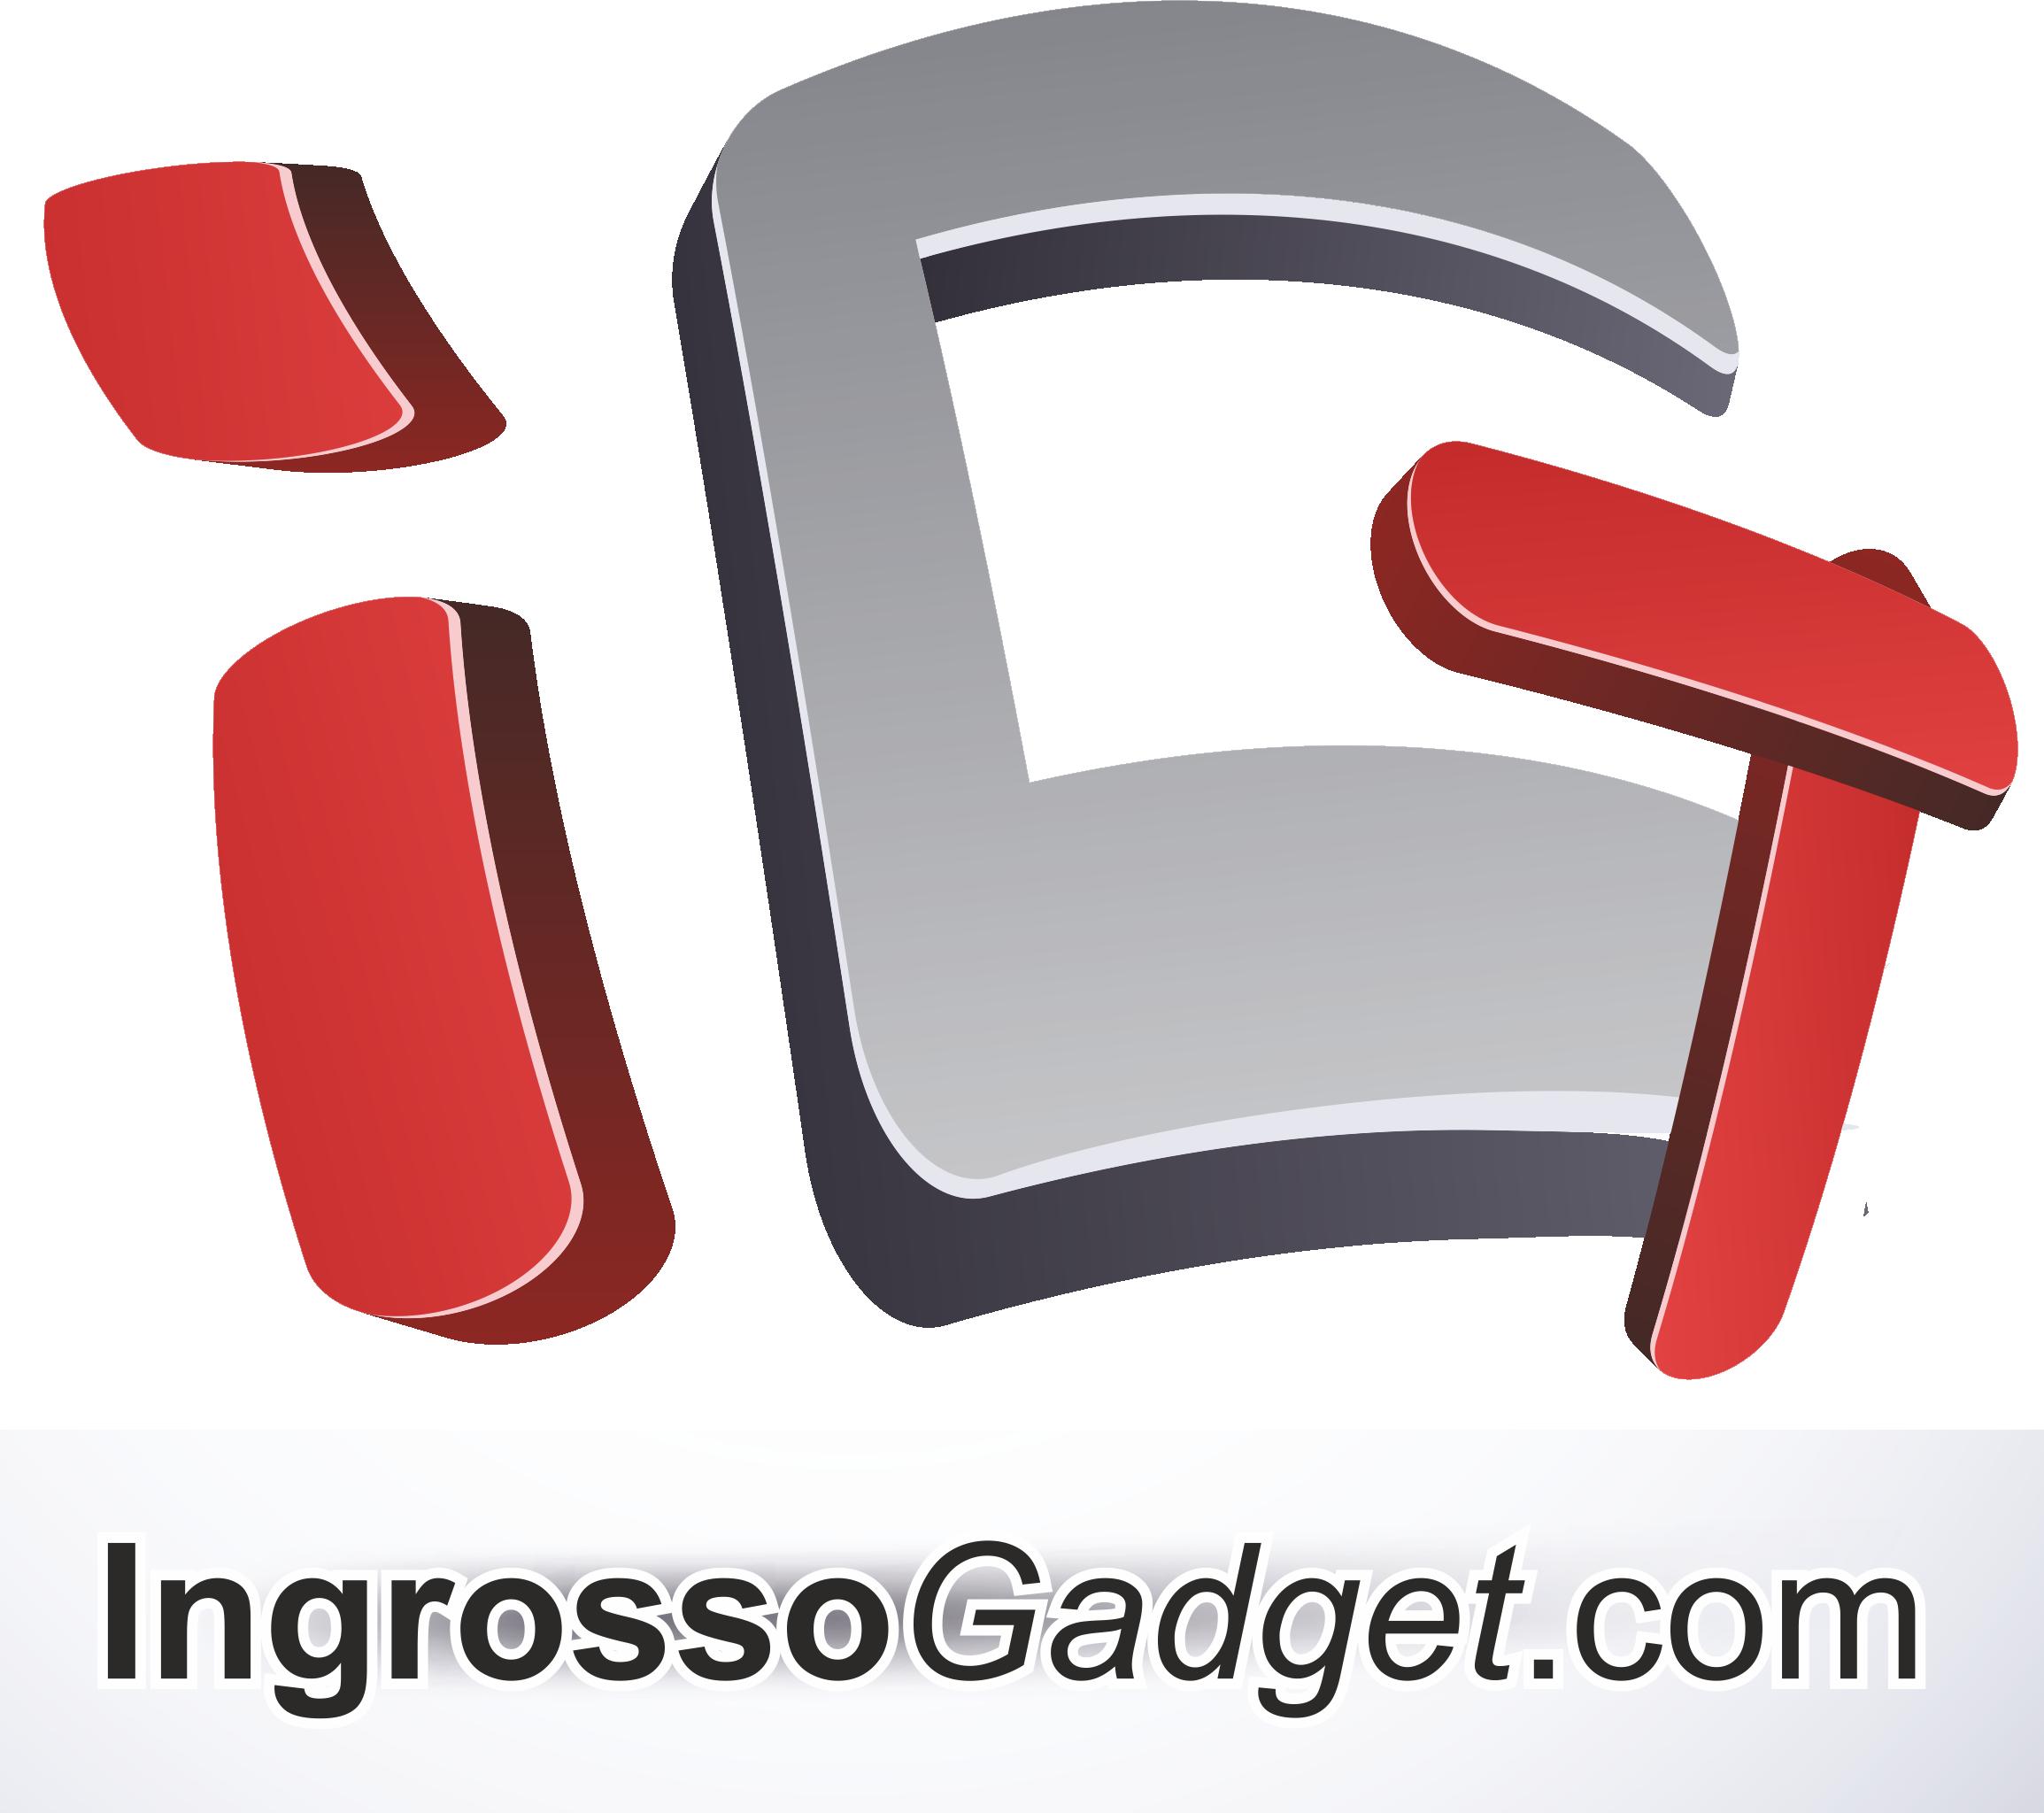 INGROSSO GADGET PROMOZIONALI